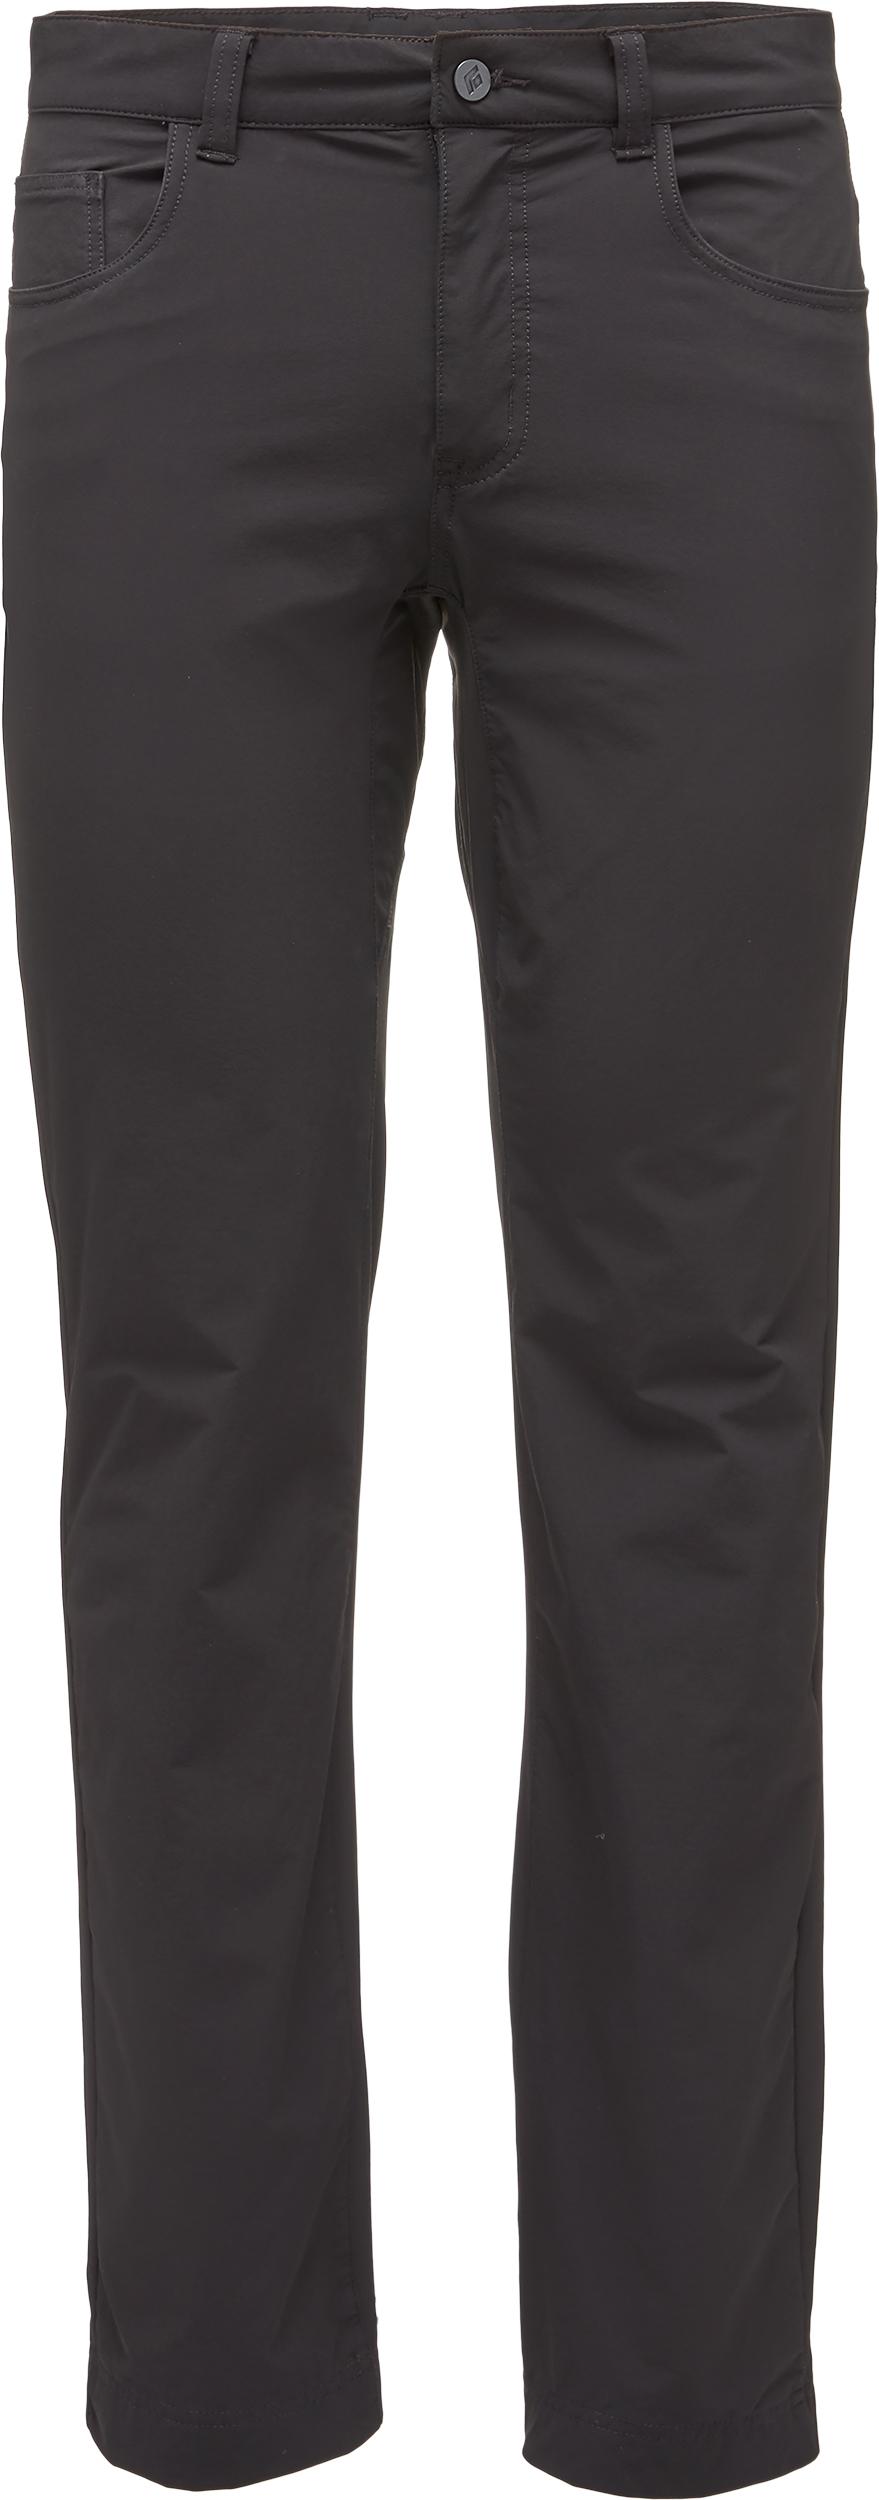 f37a80823901f9 Black Diamond Modernist Pants - Men's | MEC